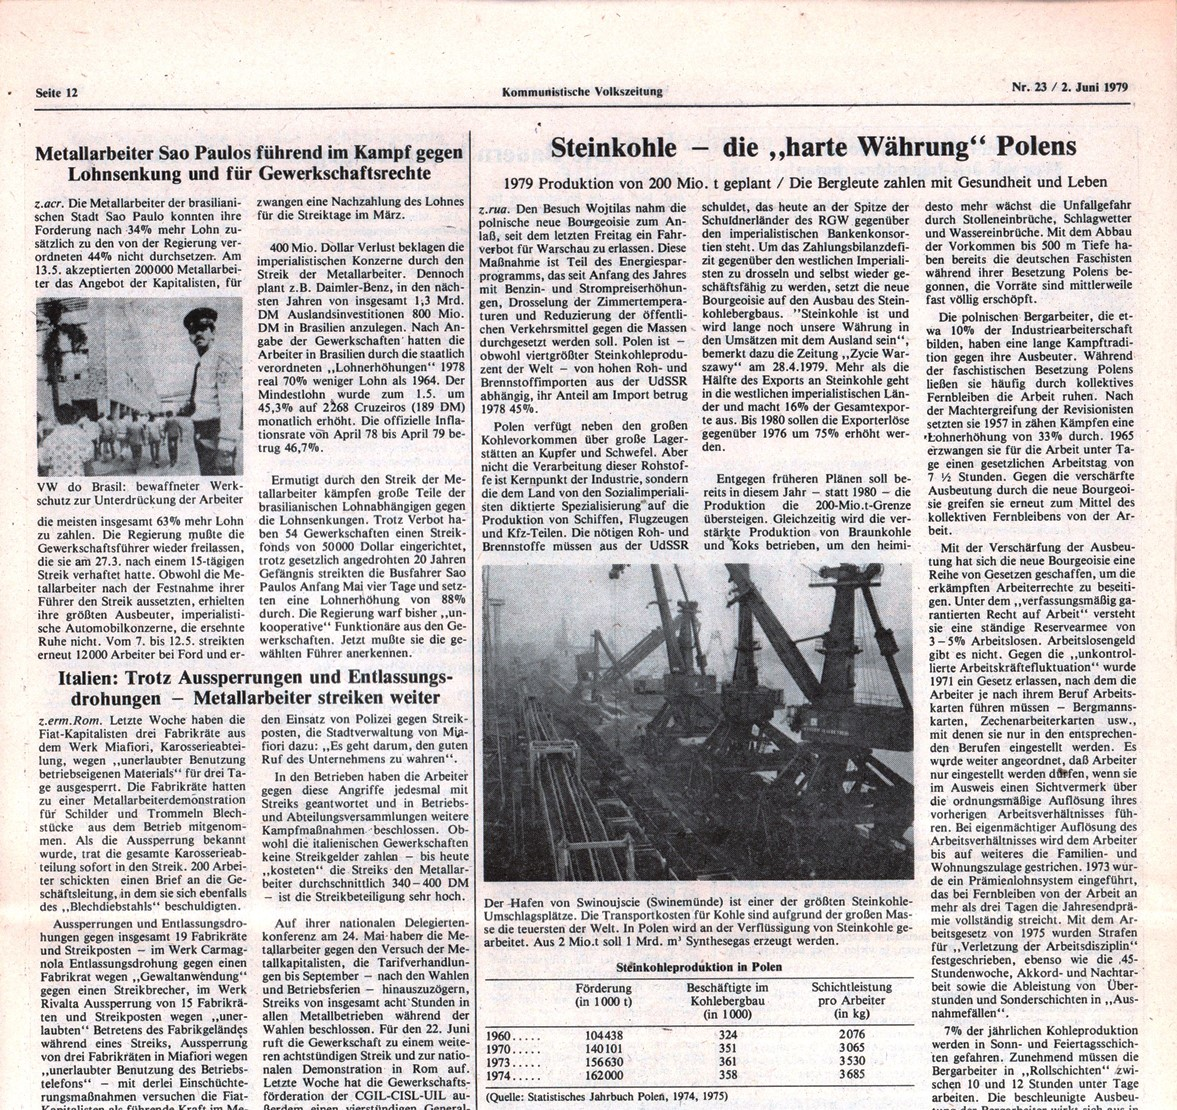 Hamburg_KVZ_1979_23_23